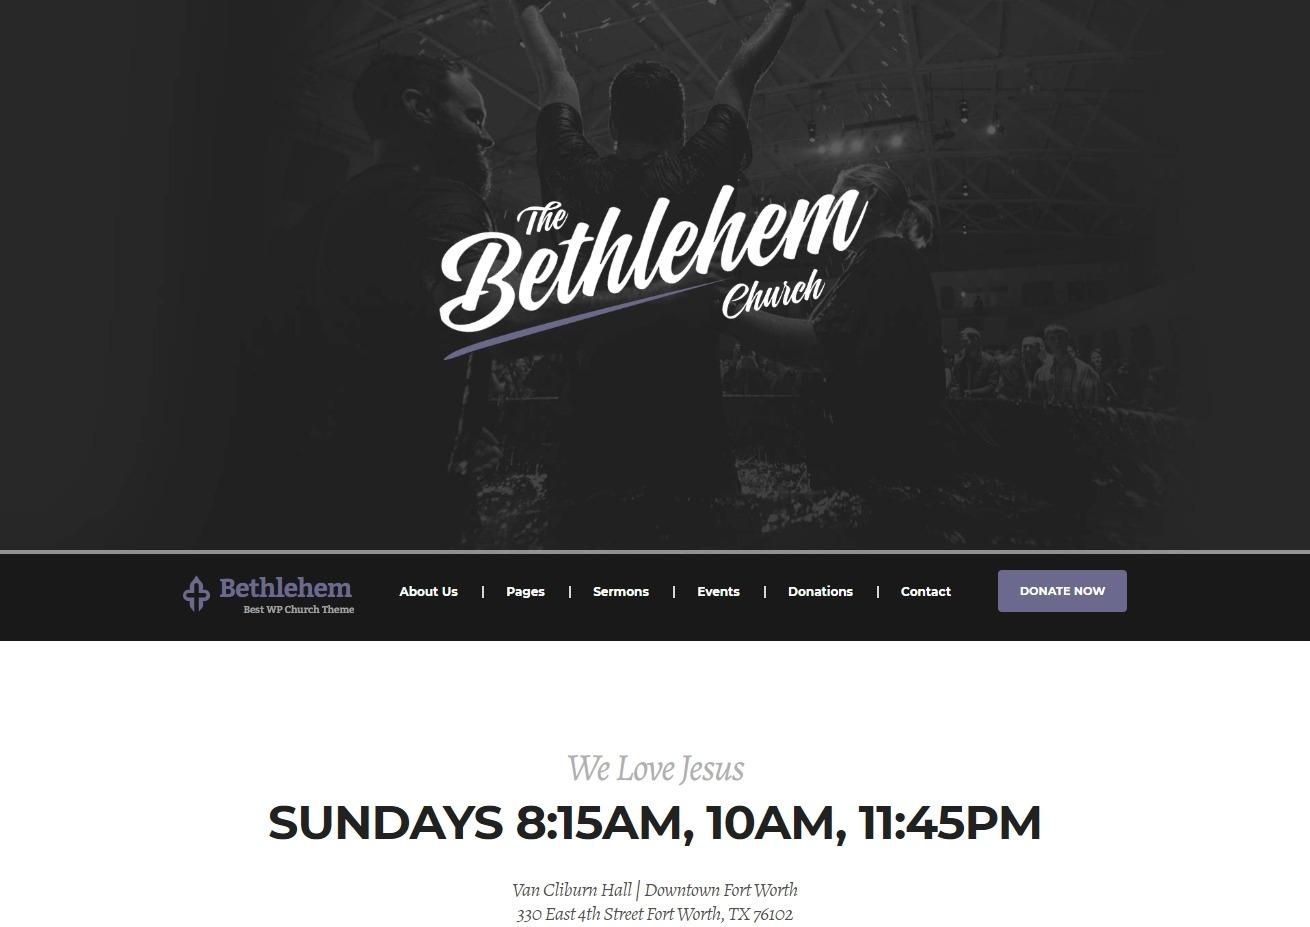 Bethlehem Stylish and Modern Church Theme for WordPress